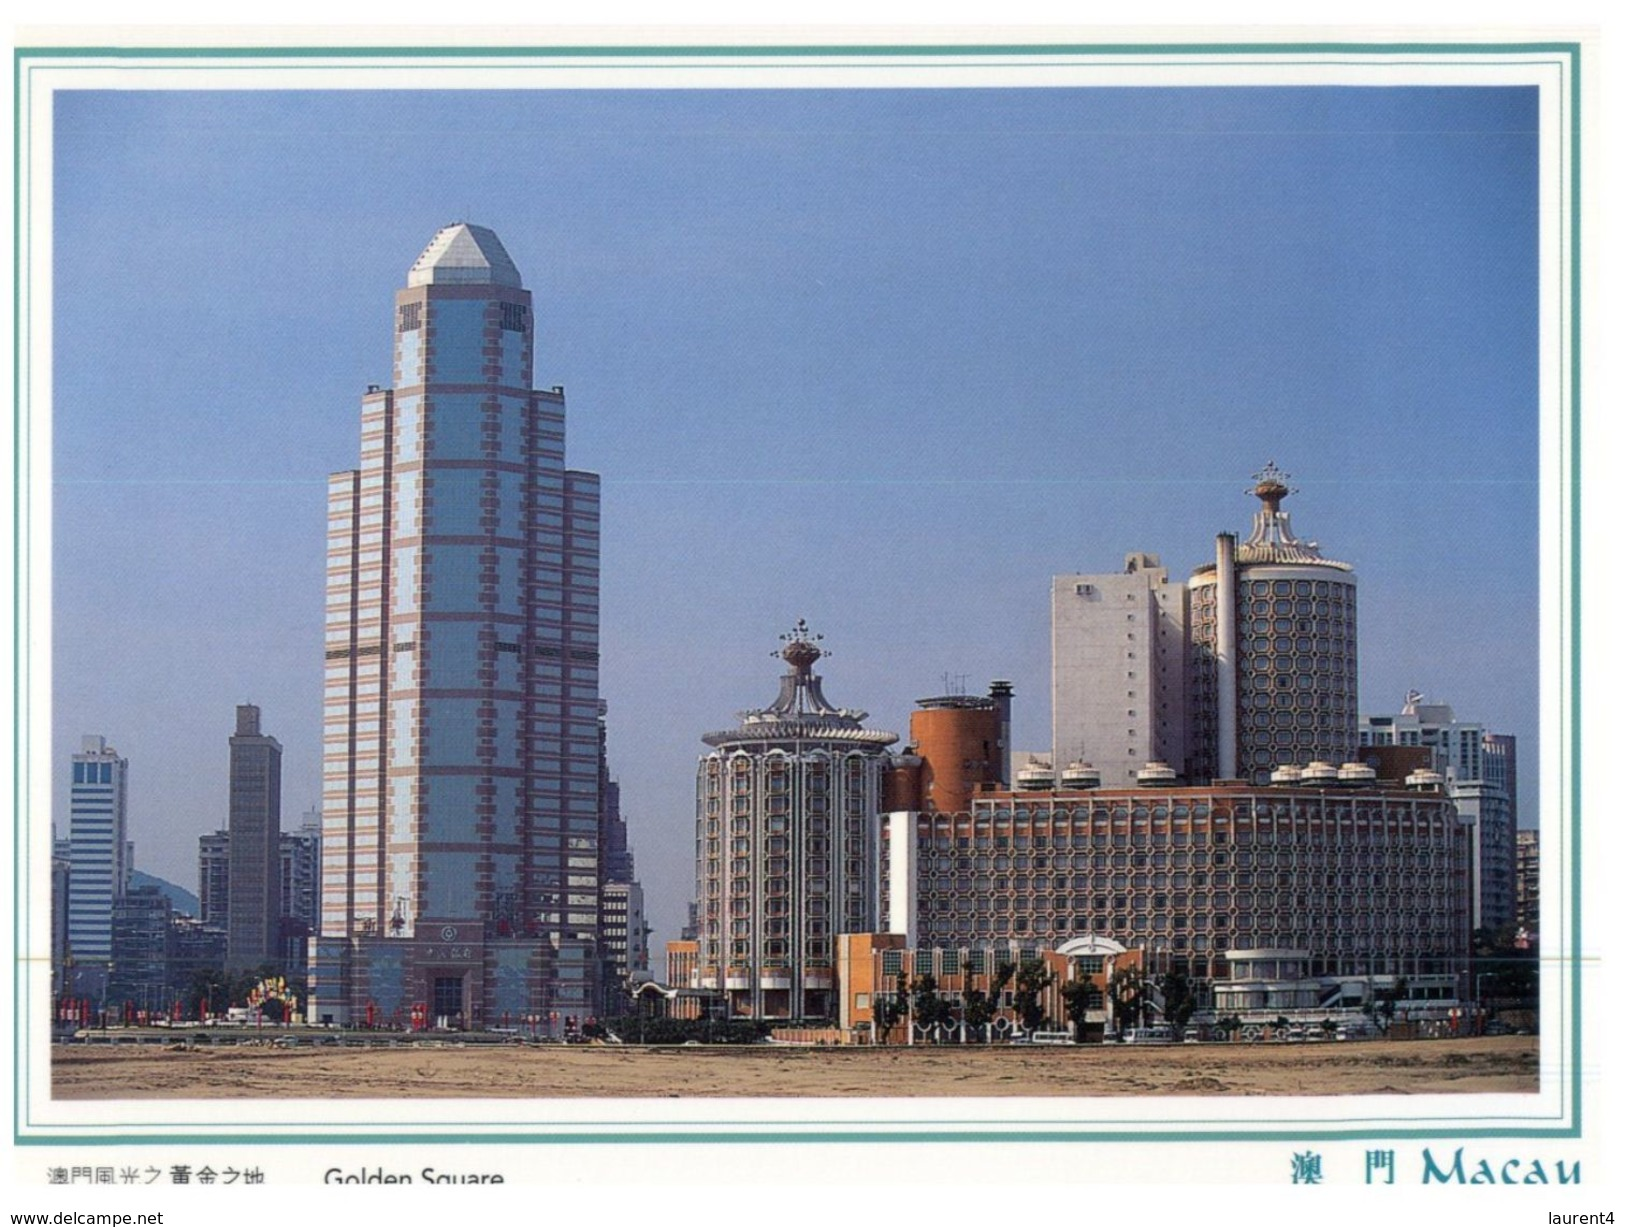 (530) Macau - Macao - Golden Square - Cartes Postales